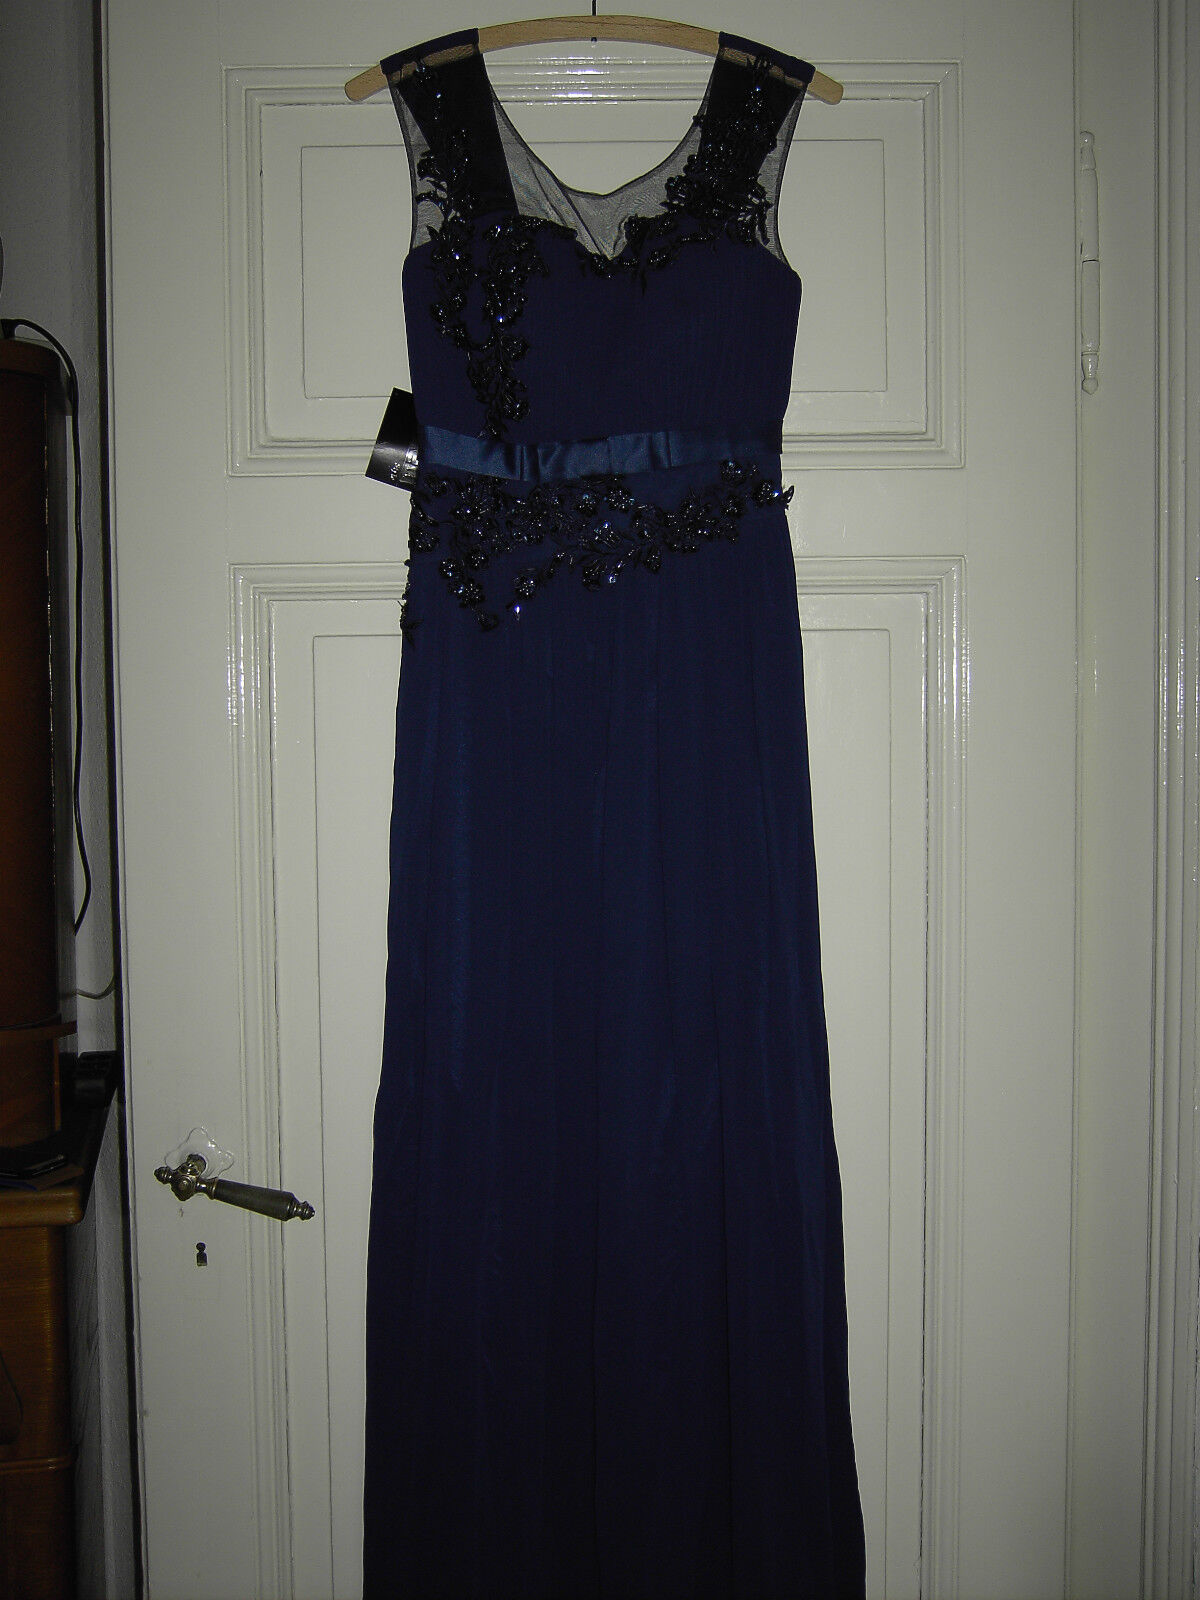 Damen Abendkleid Ballkleid dunkelblau NEU Gr 38 M